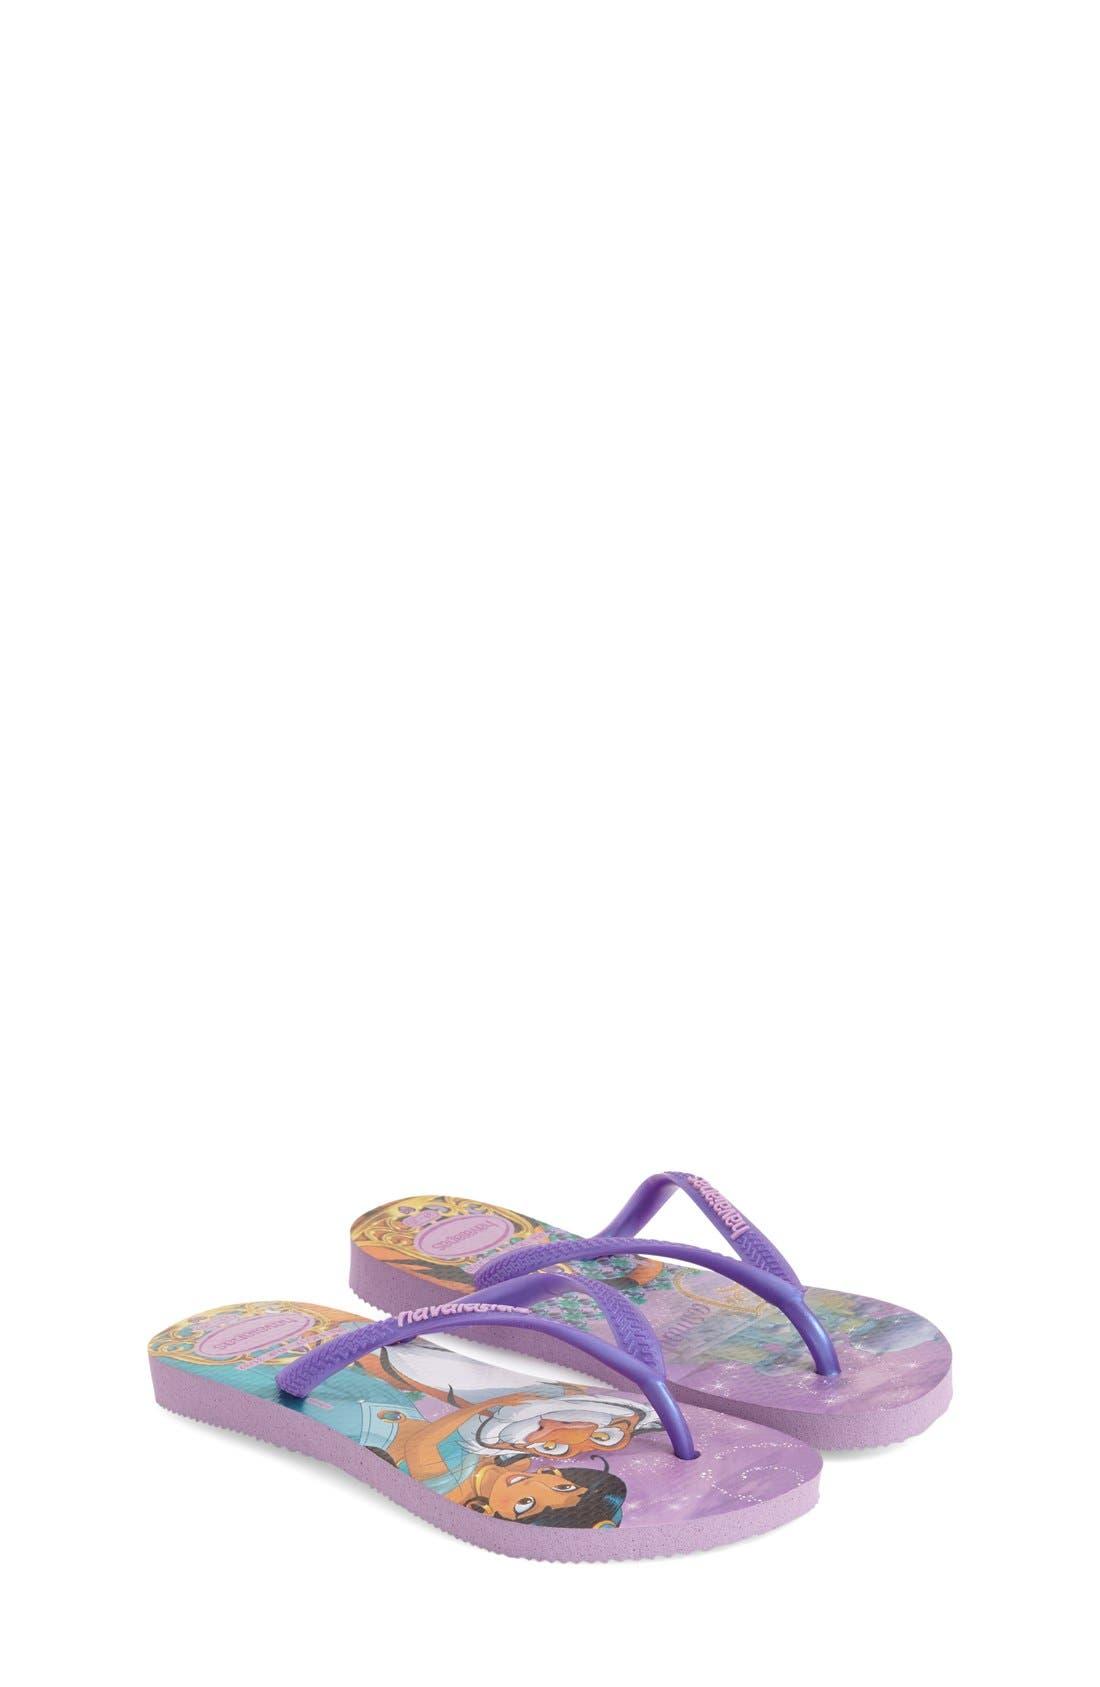 Alternate Image 4  - Havaianas 'Disney Princess' Flip Flops (Toddler & Little Kid)